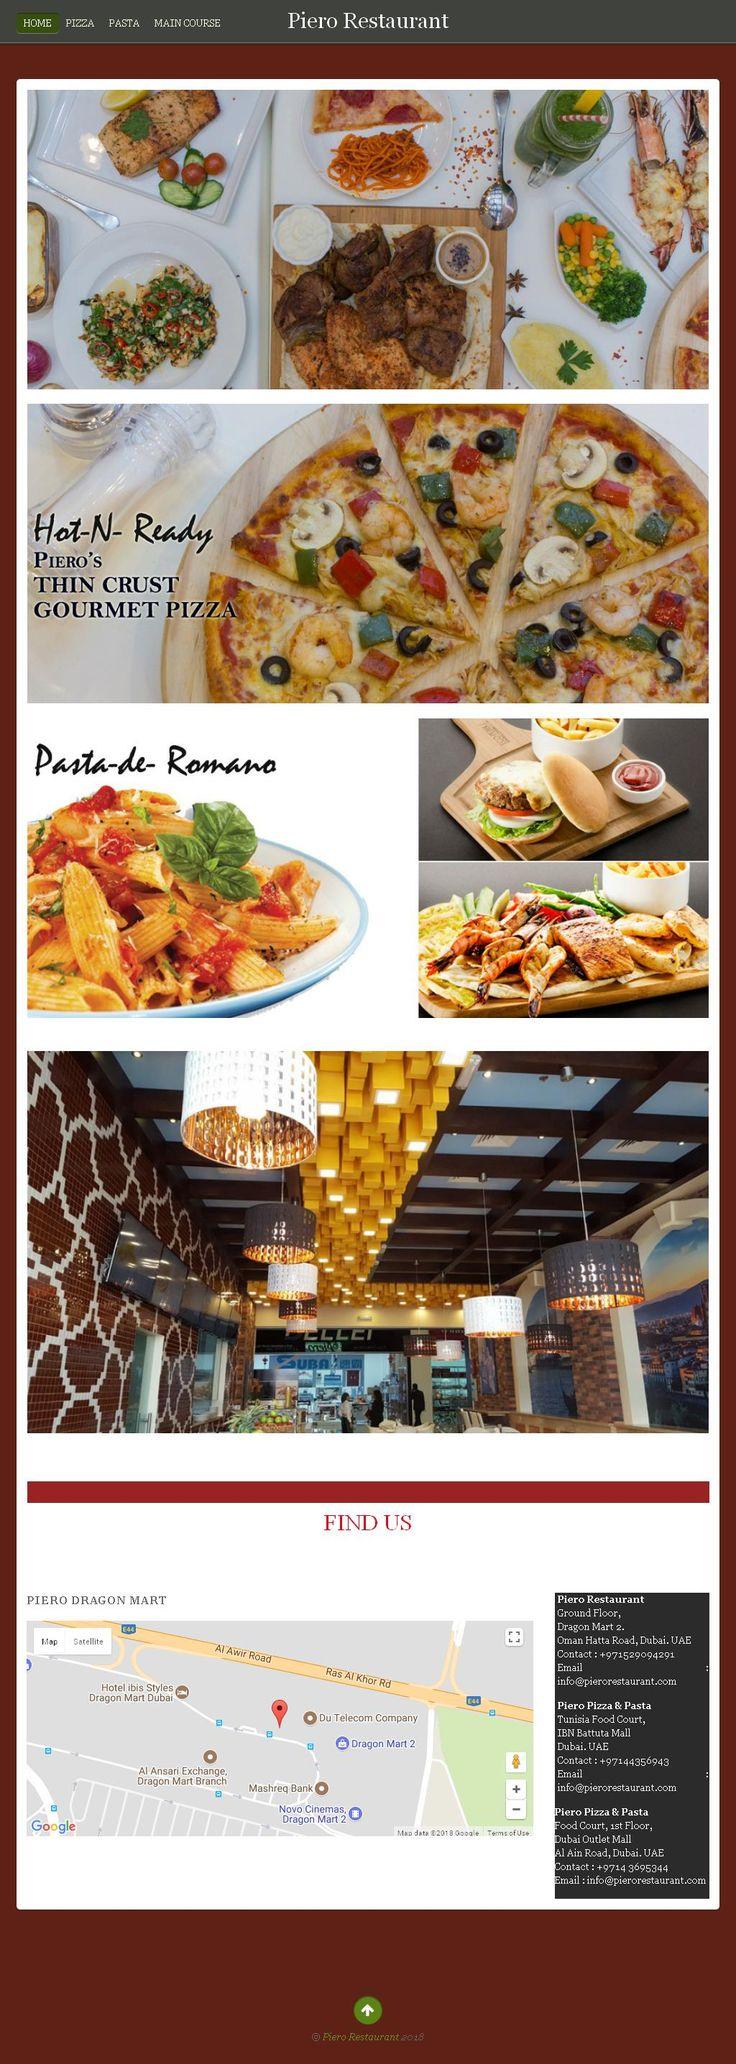 Map Uae Google%0A Piero Fast Food Restaurant Ibn Battuta Mall     Garden Cross Road G Floor   Shop F   Jebel Ali         Jebel Ali  Dubai   www HaiUAE com is a complete